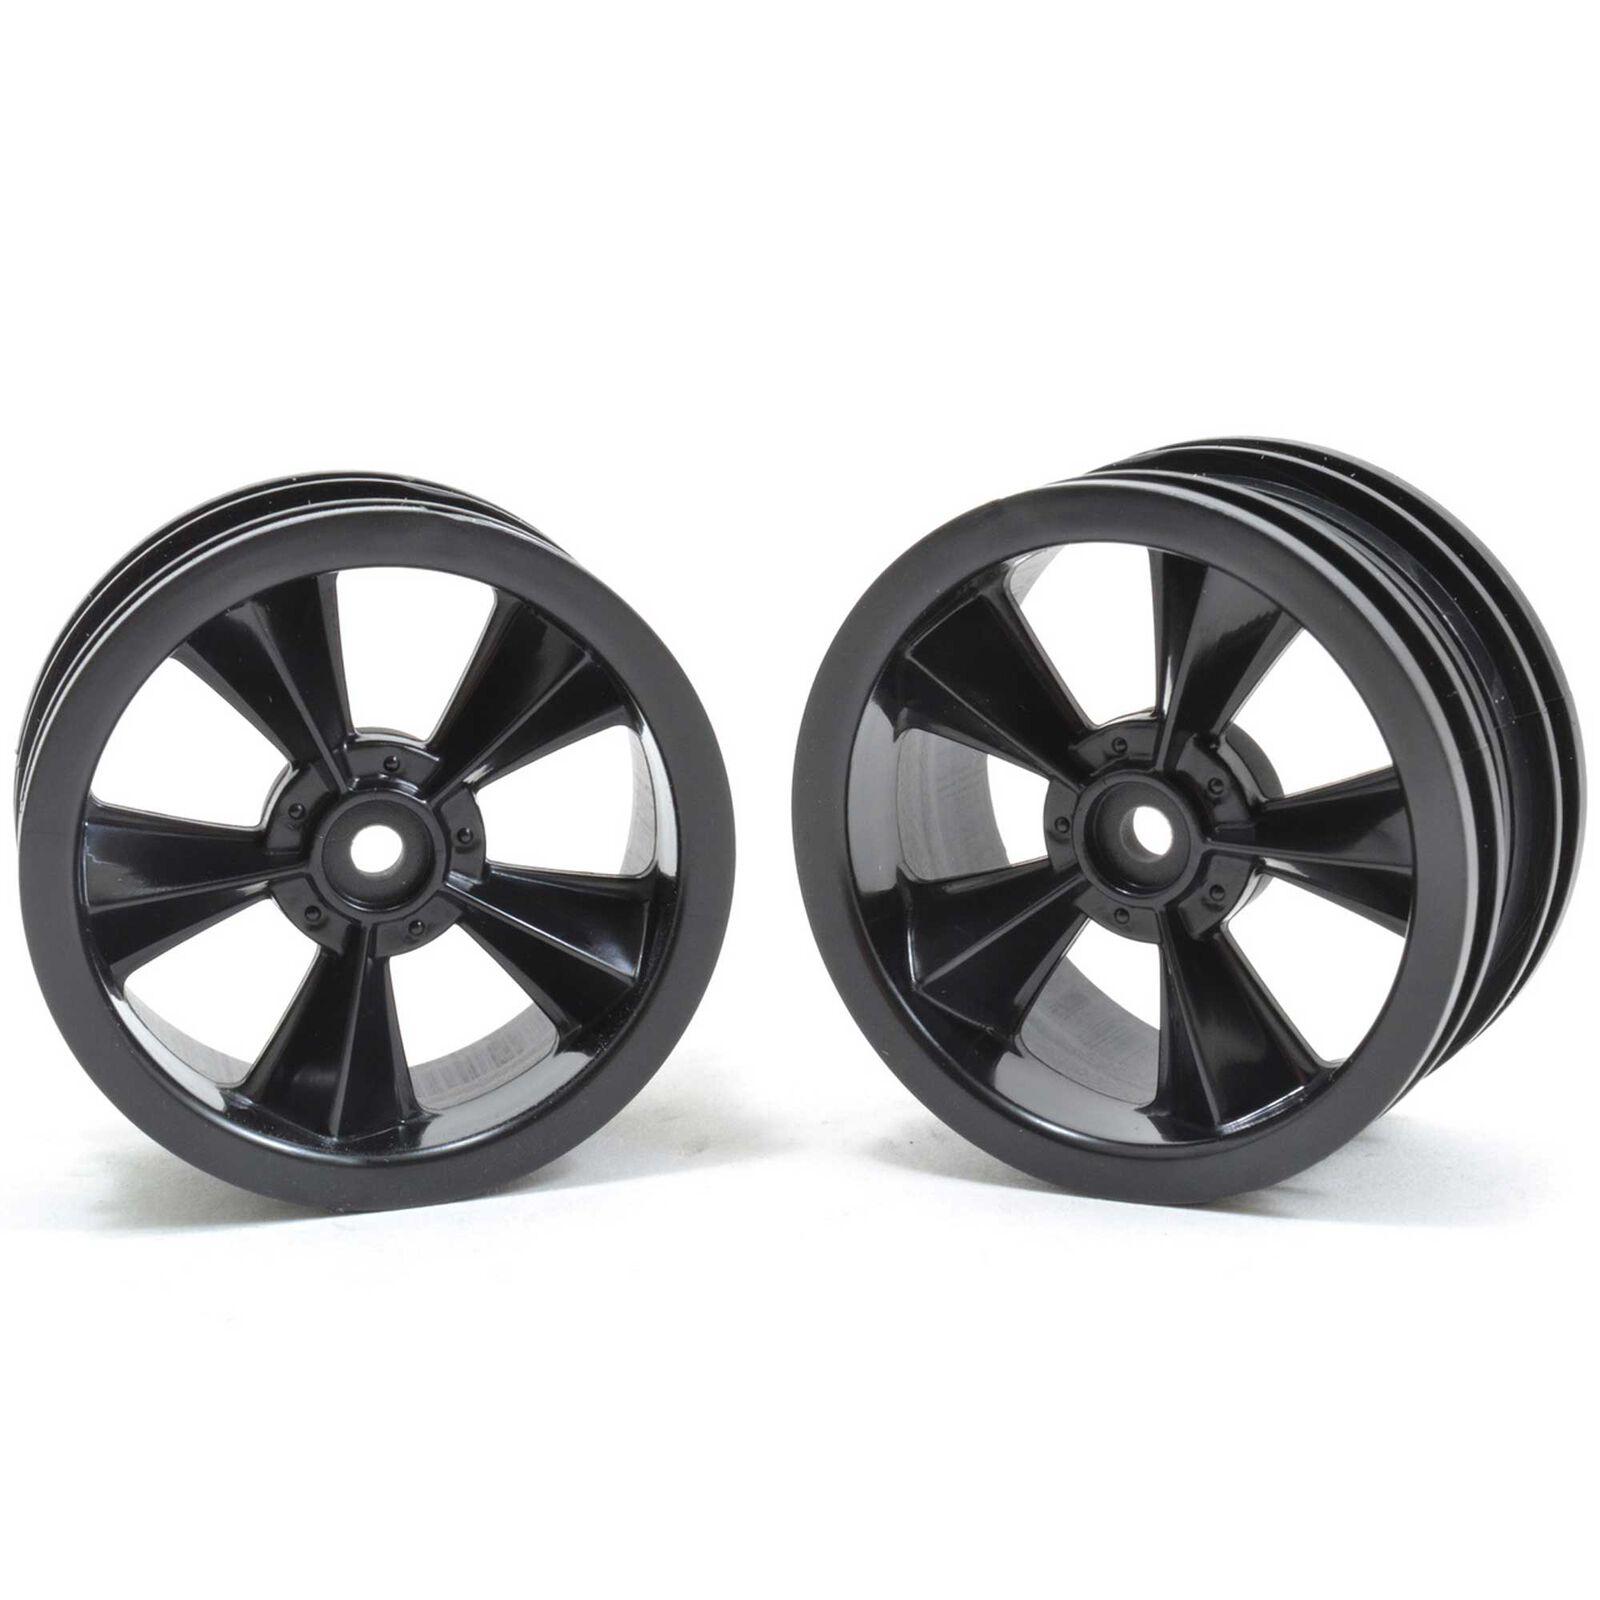 """N2O"" Resto-Mod Sedan Wheels, Gloss Black (2)"